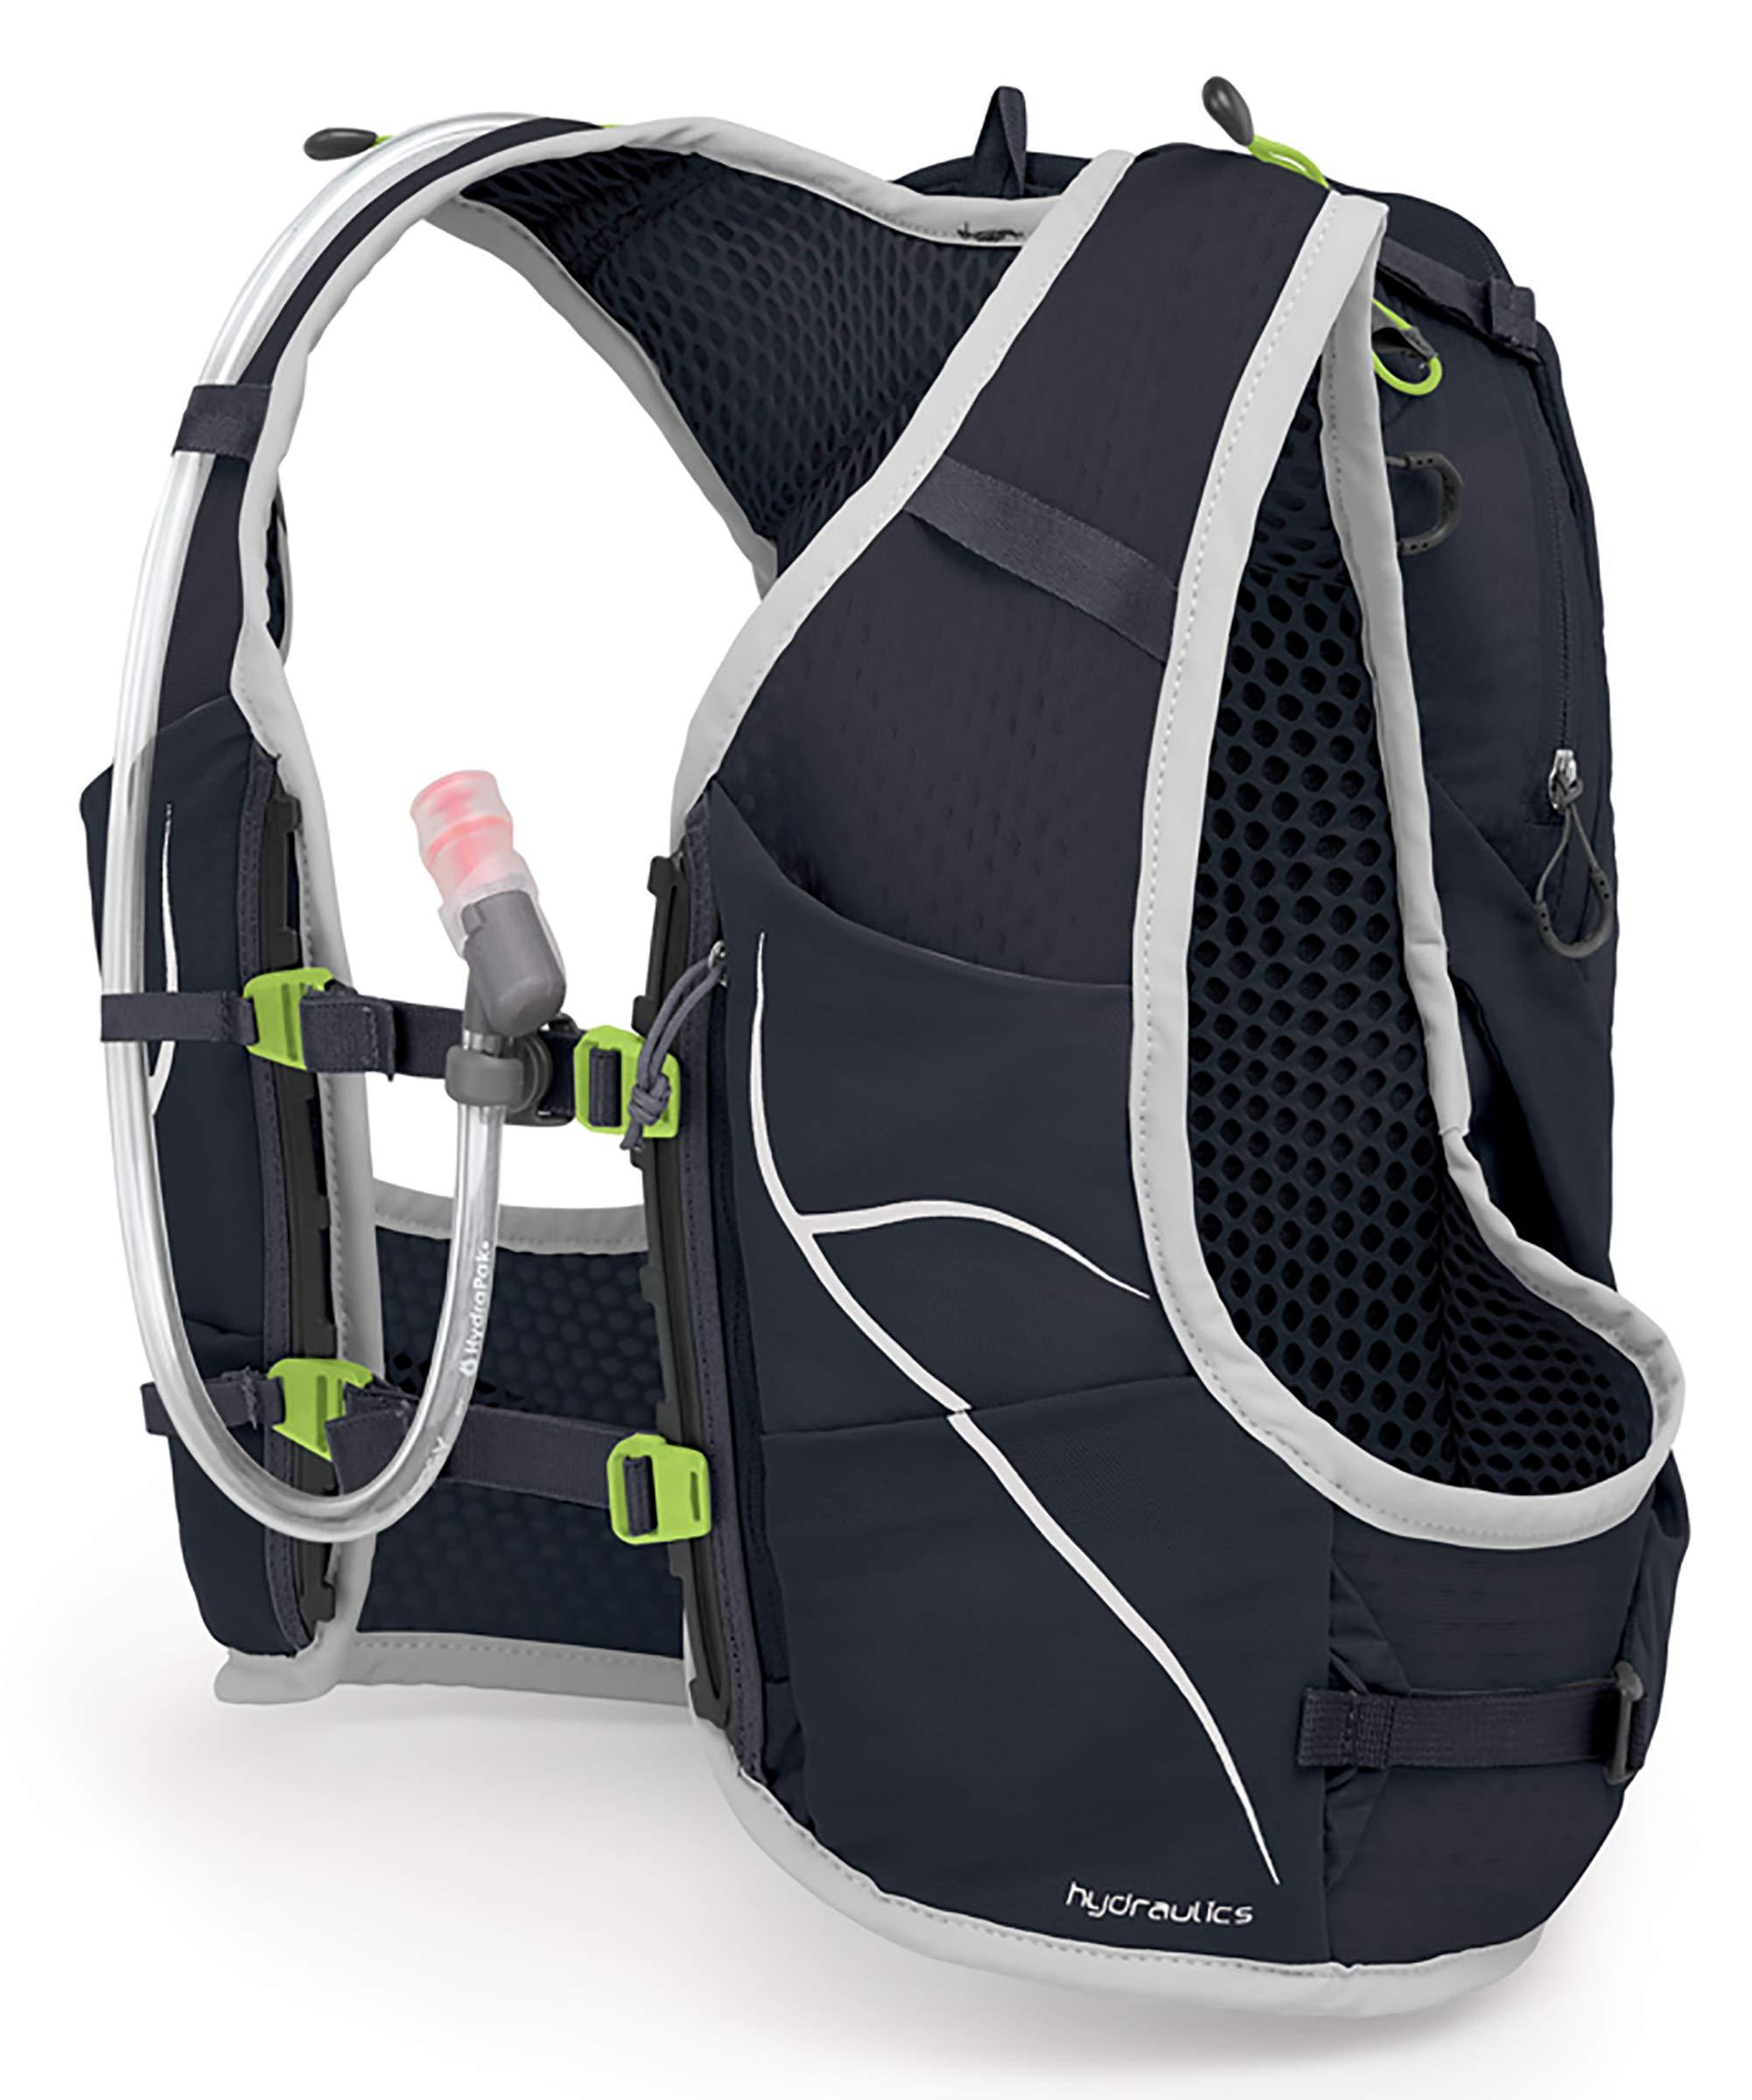 Osprey Packs Duro 6 Running Hydration Vest, Alpine Black, Small/Medium by Osprey (Image #2)